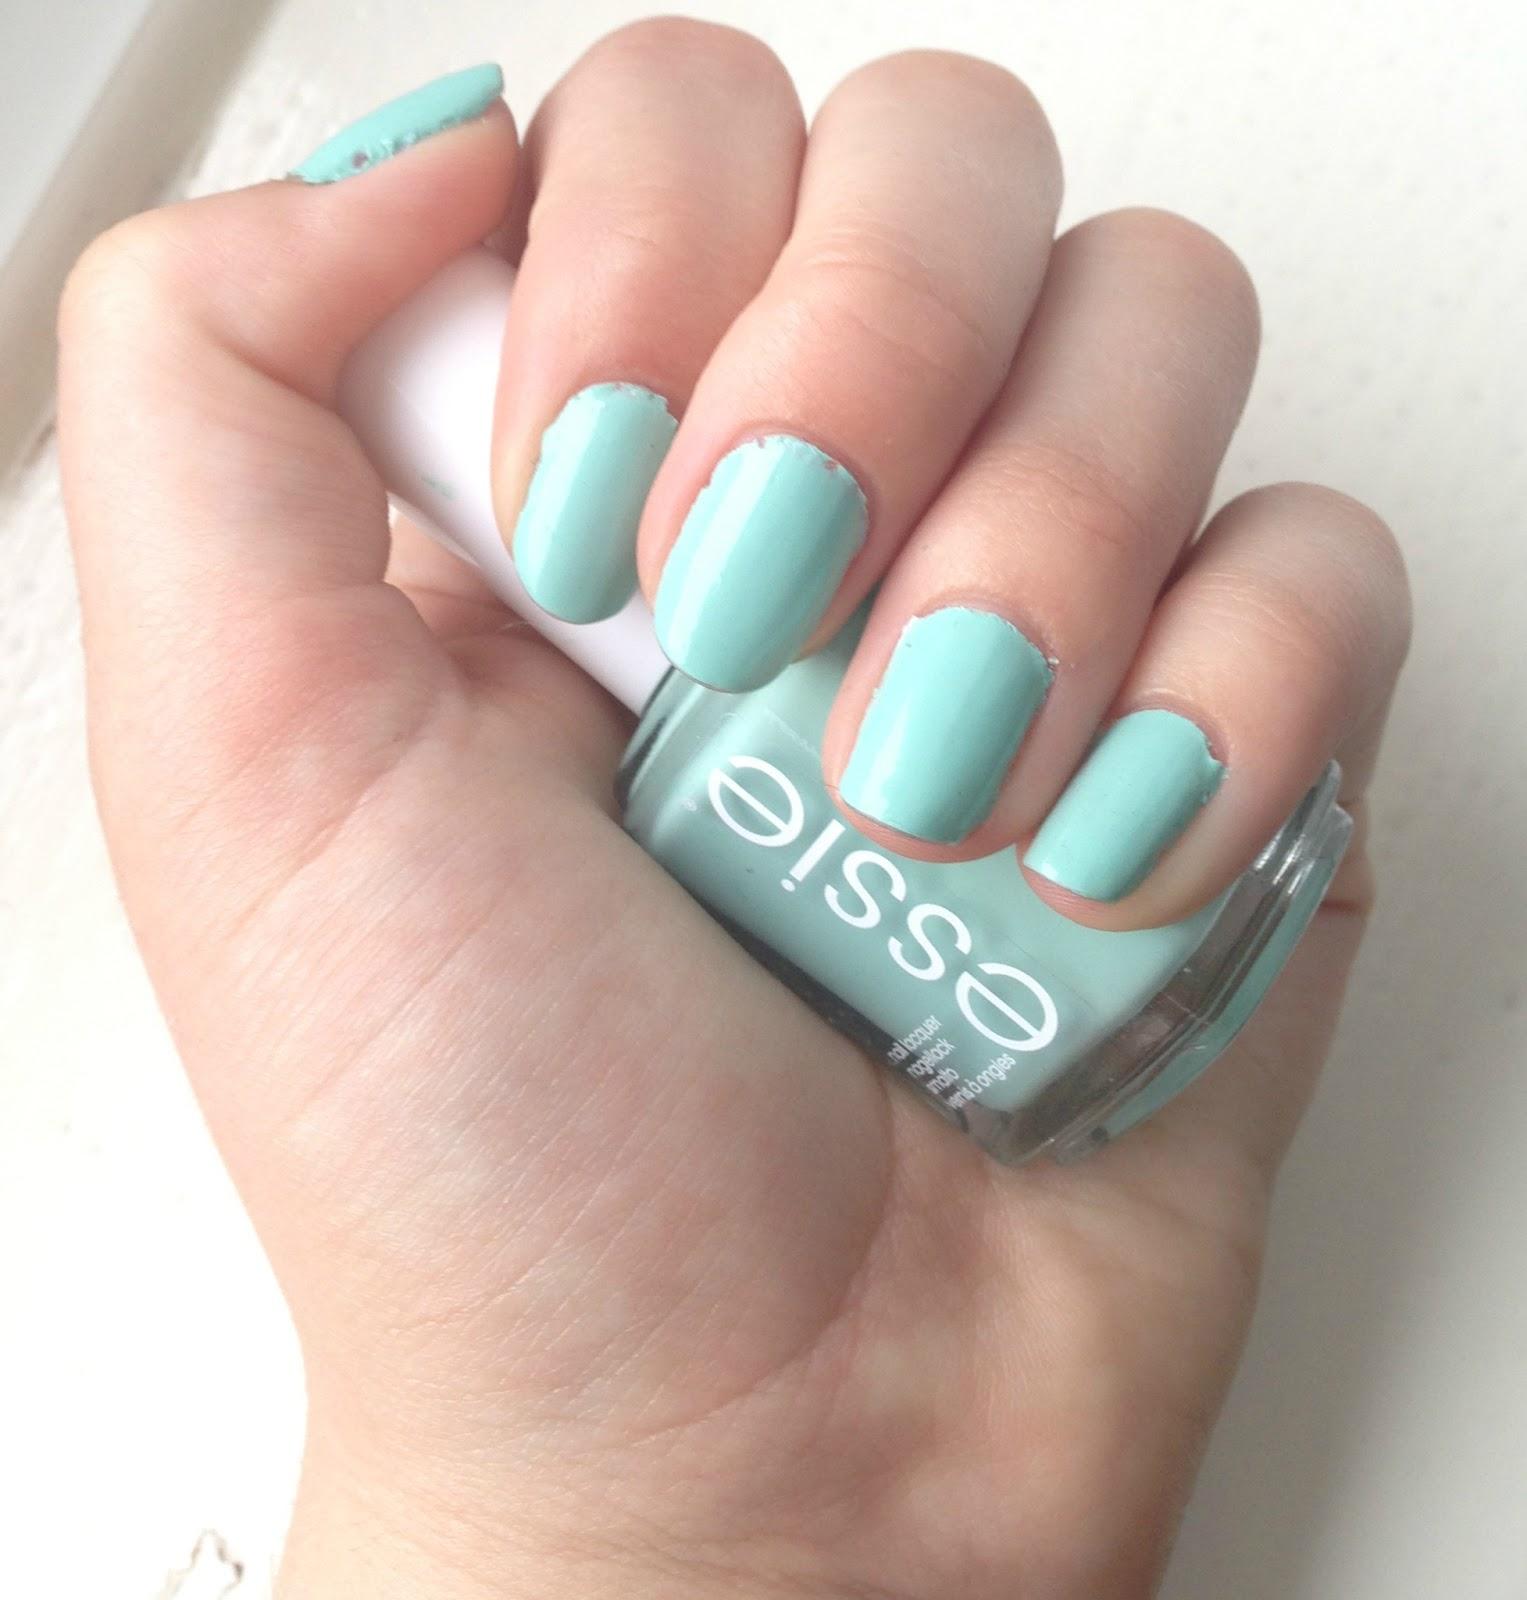 Beauty Devotion: Product Spotlight: Essie\'s Mint Candy Apple Nail Polish